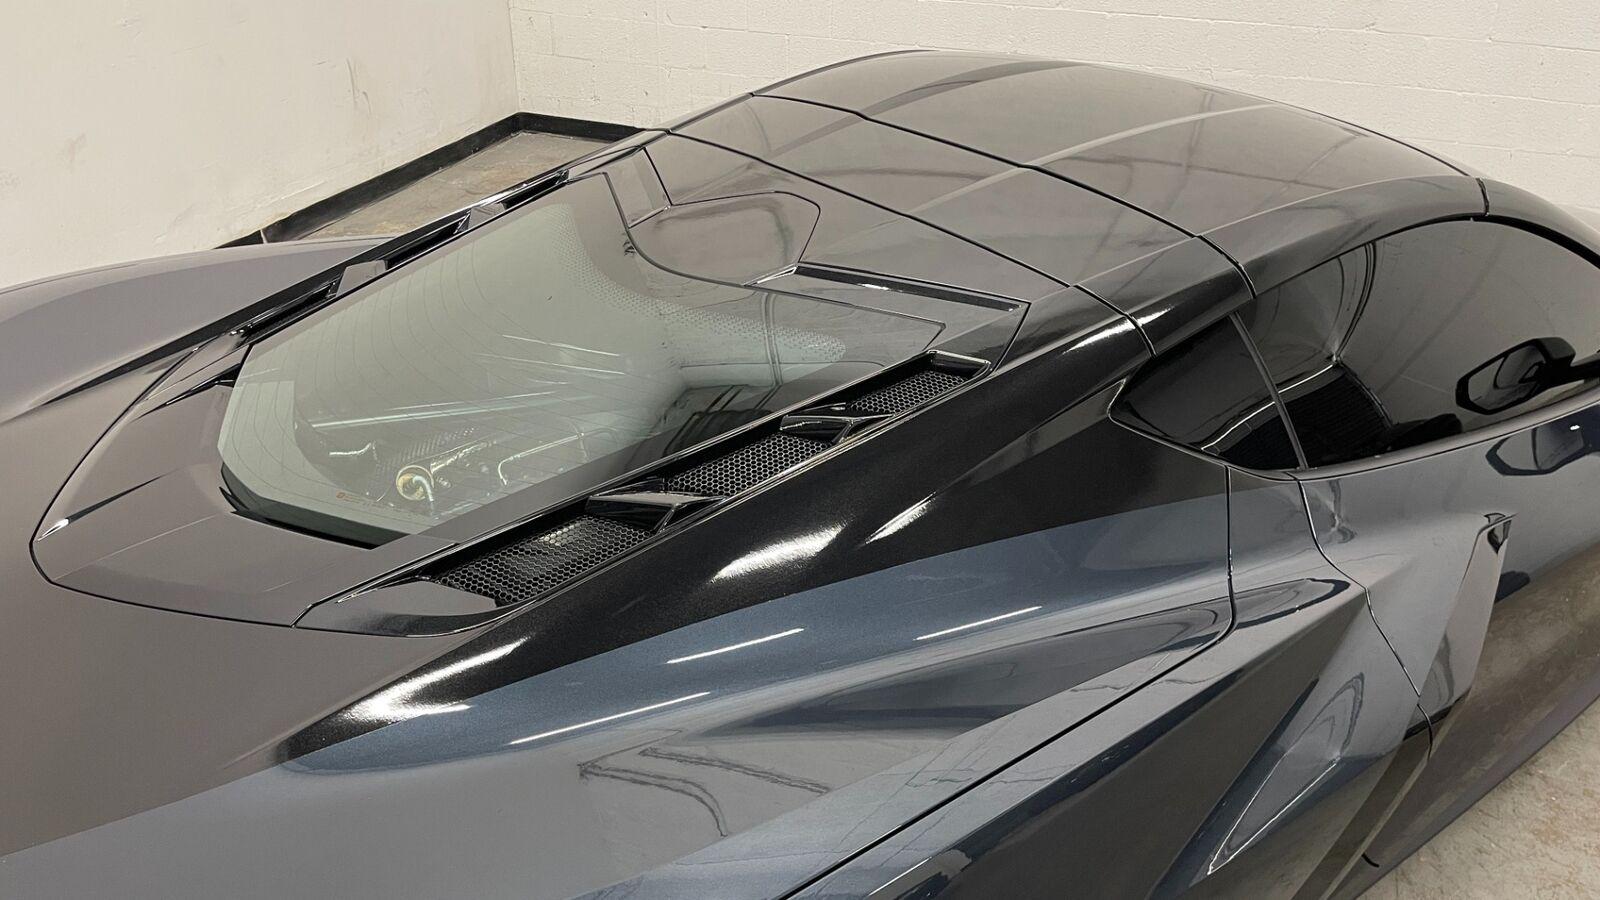 2020 Gray Chevrolet Corvette Stingray 1LT | C7 Corvette Photo 7